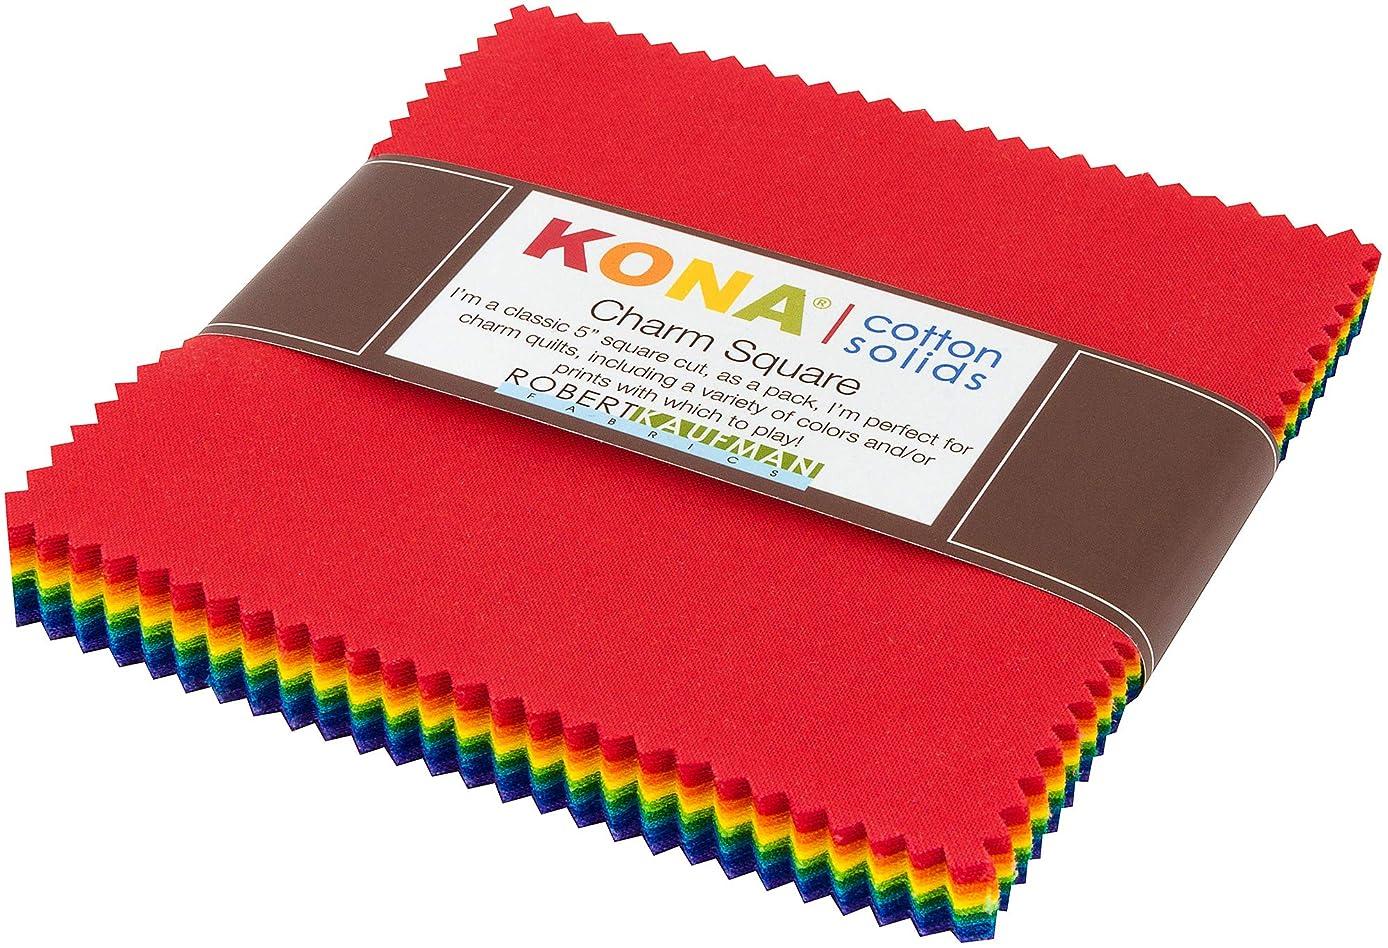 Kona Cotton Solids Bright Rainbow Charm Square 42 5-inch Squares Robert Kaufman CHS-734-42